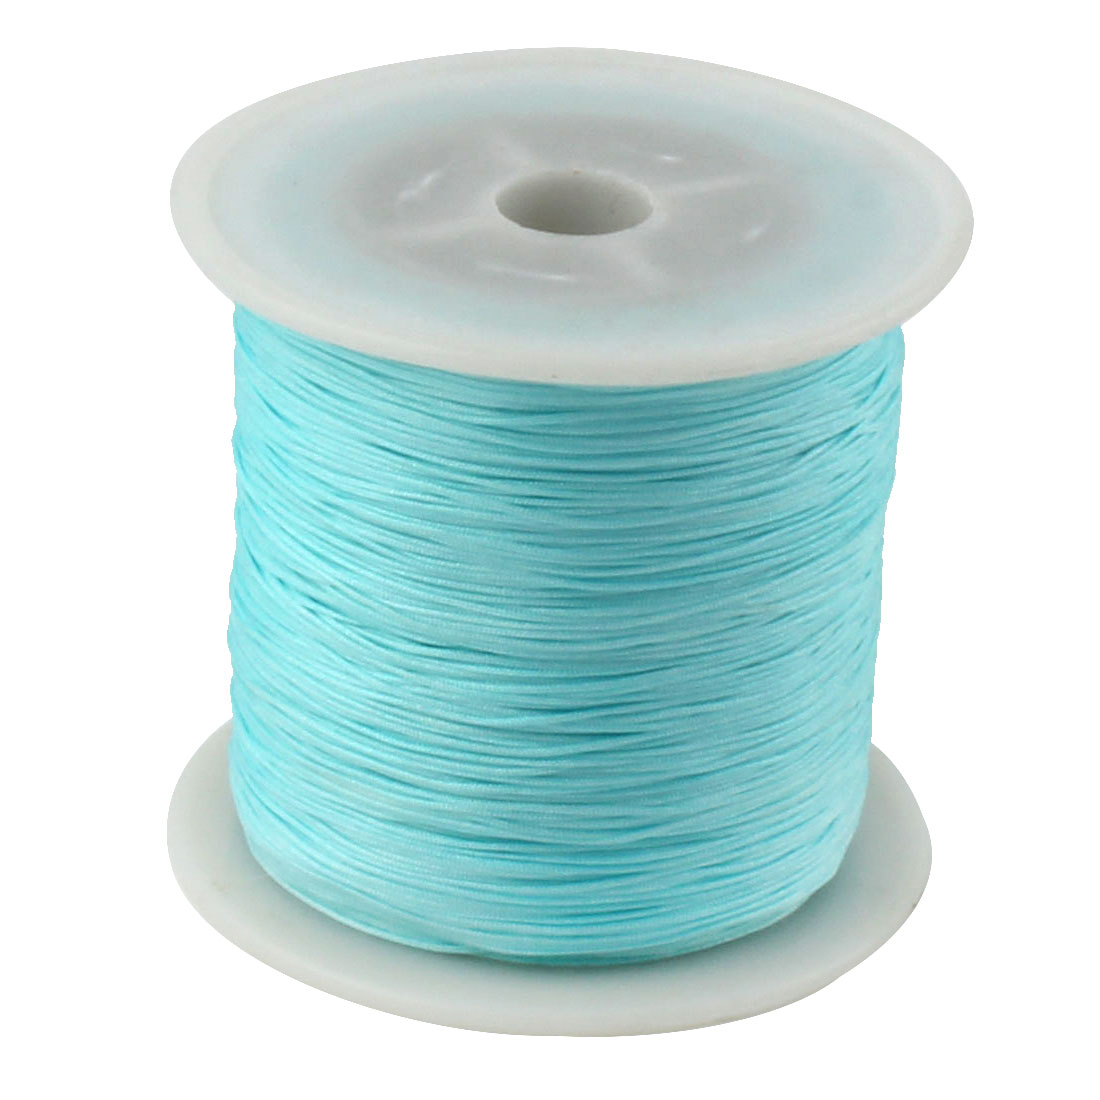 Nylon DIY Art Craft Braided Beading Cord String Rope Roll Sky Blue 153 Yards